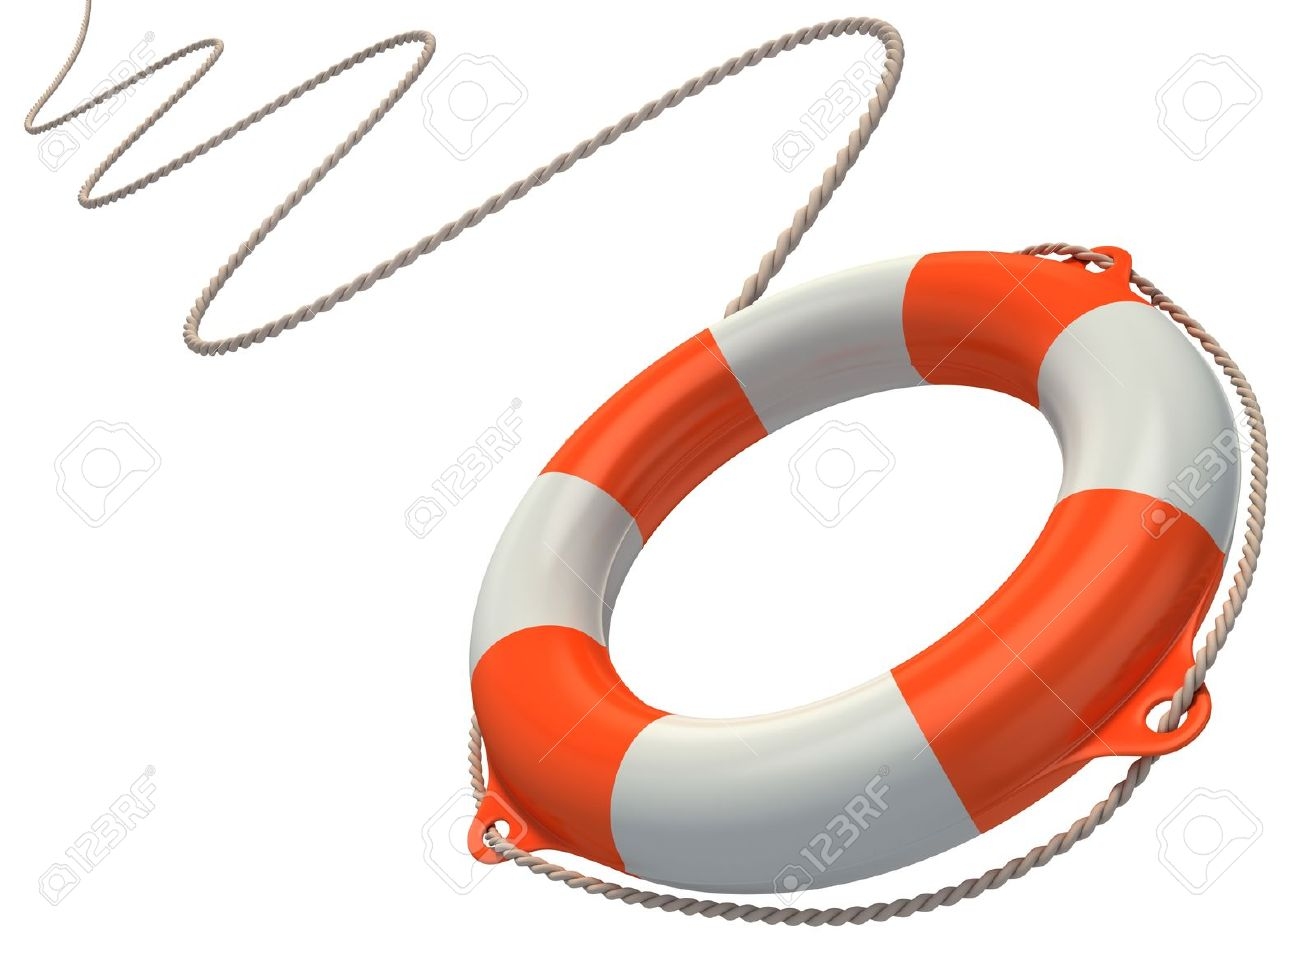 1300x974 Ring Clipart Lifeguard